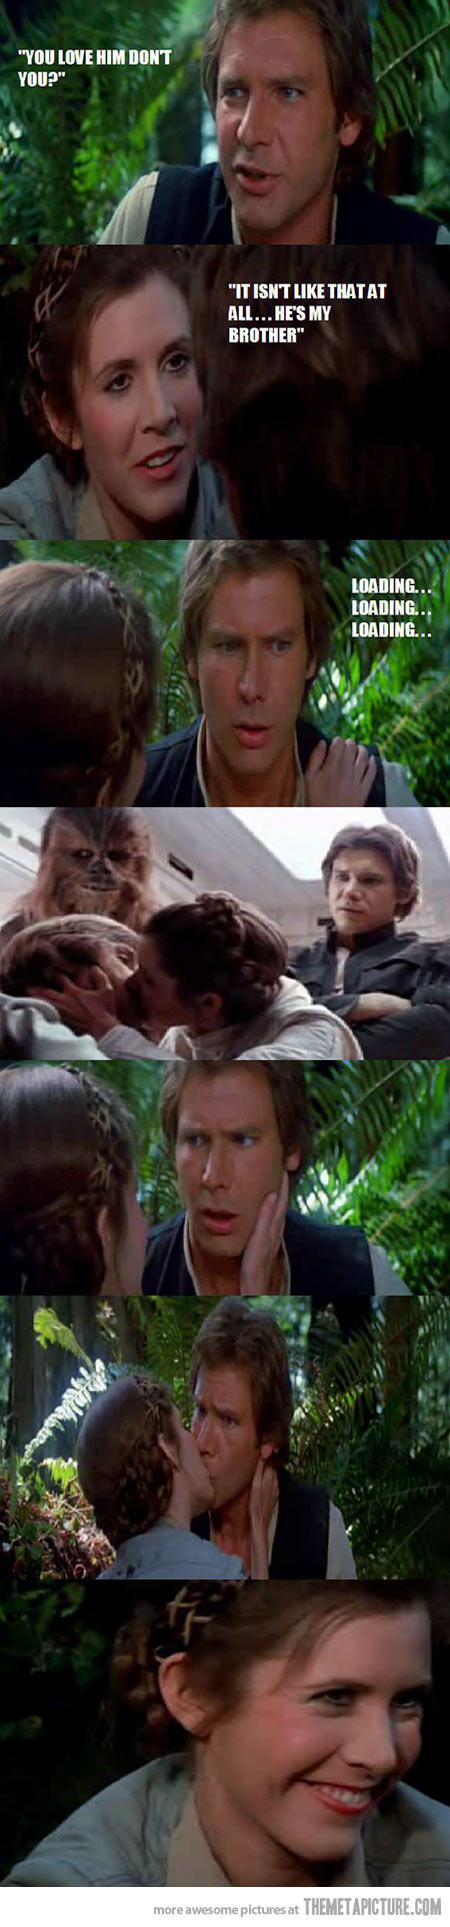 Solo S Sudden Realization Star Wars Memes Star Wars Humor Funny Star Wars Memes